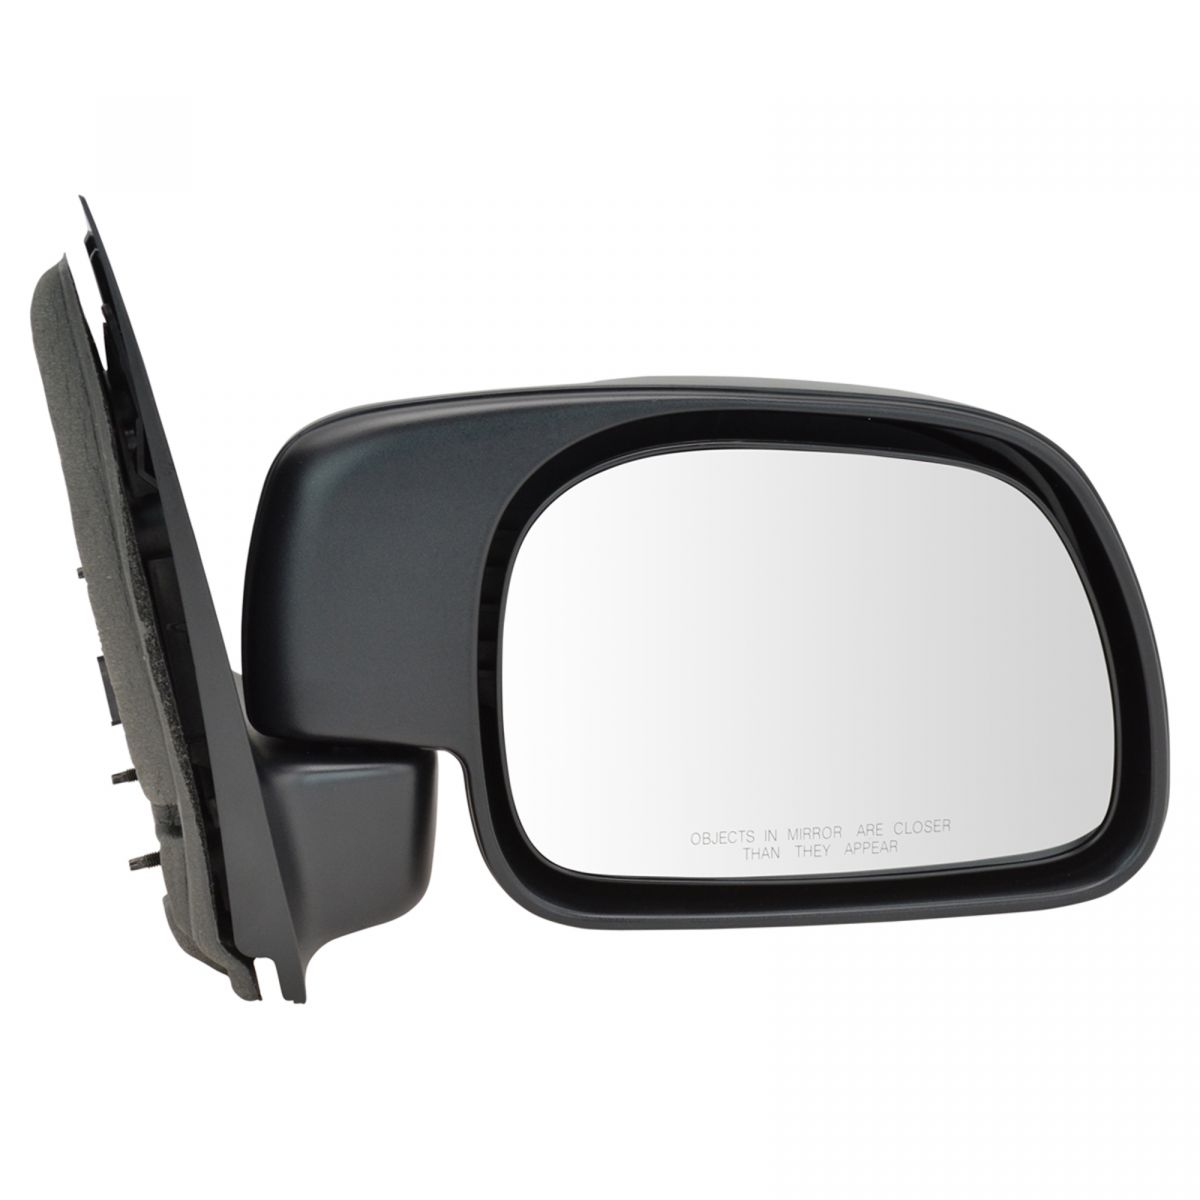 Dorman Manual Power Mirror Glass RH Right for Excursion F250 F350 F450 F550